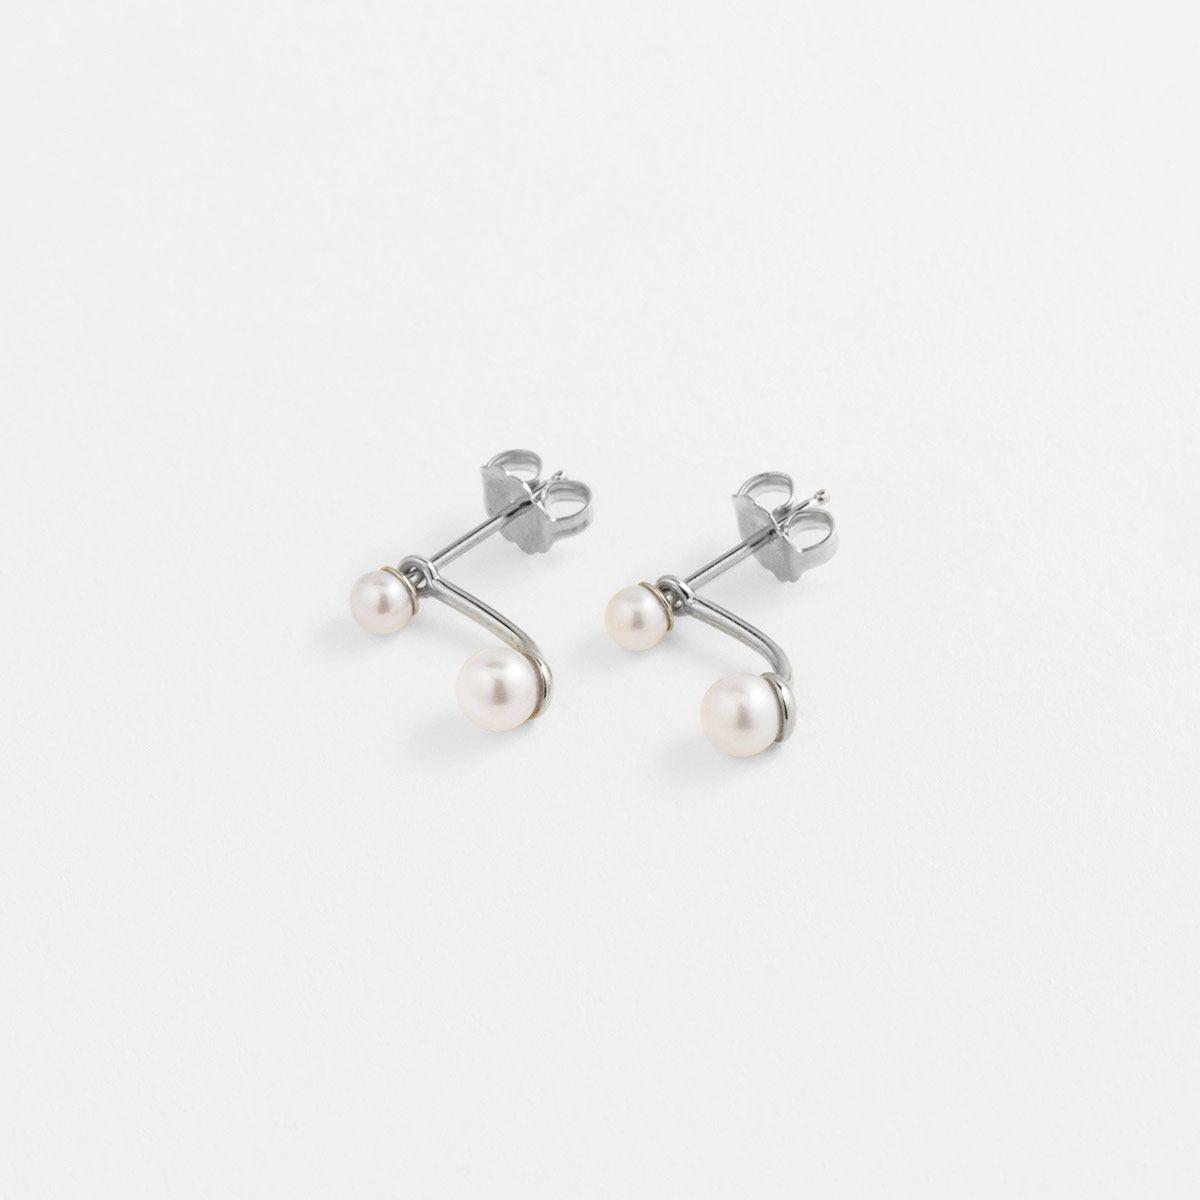 Jasna - Perlenohrringe - Silber